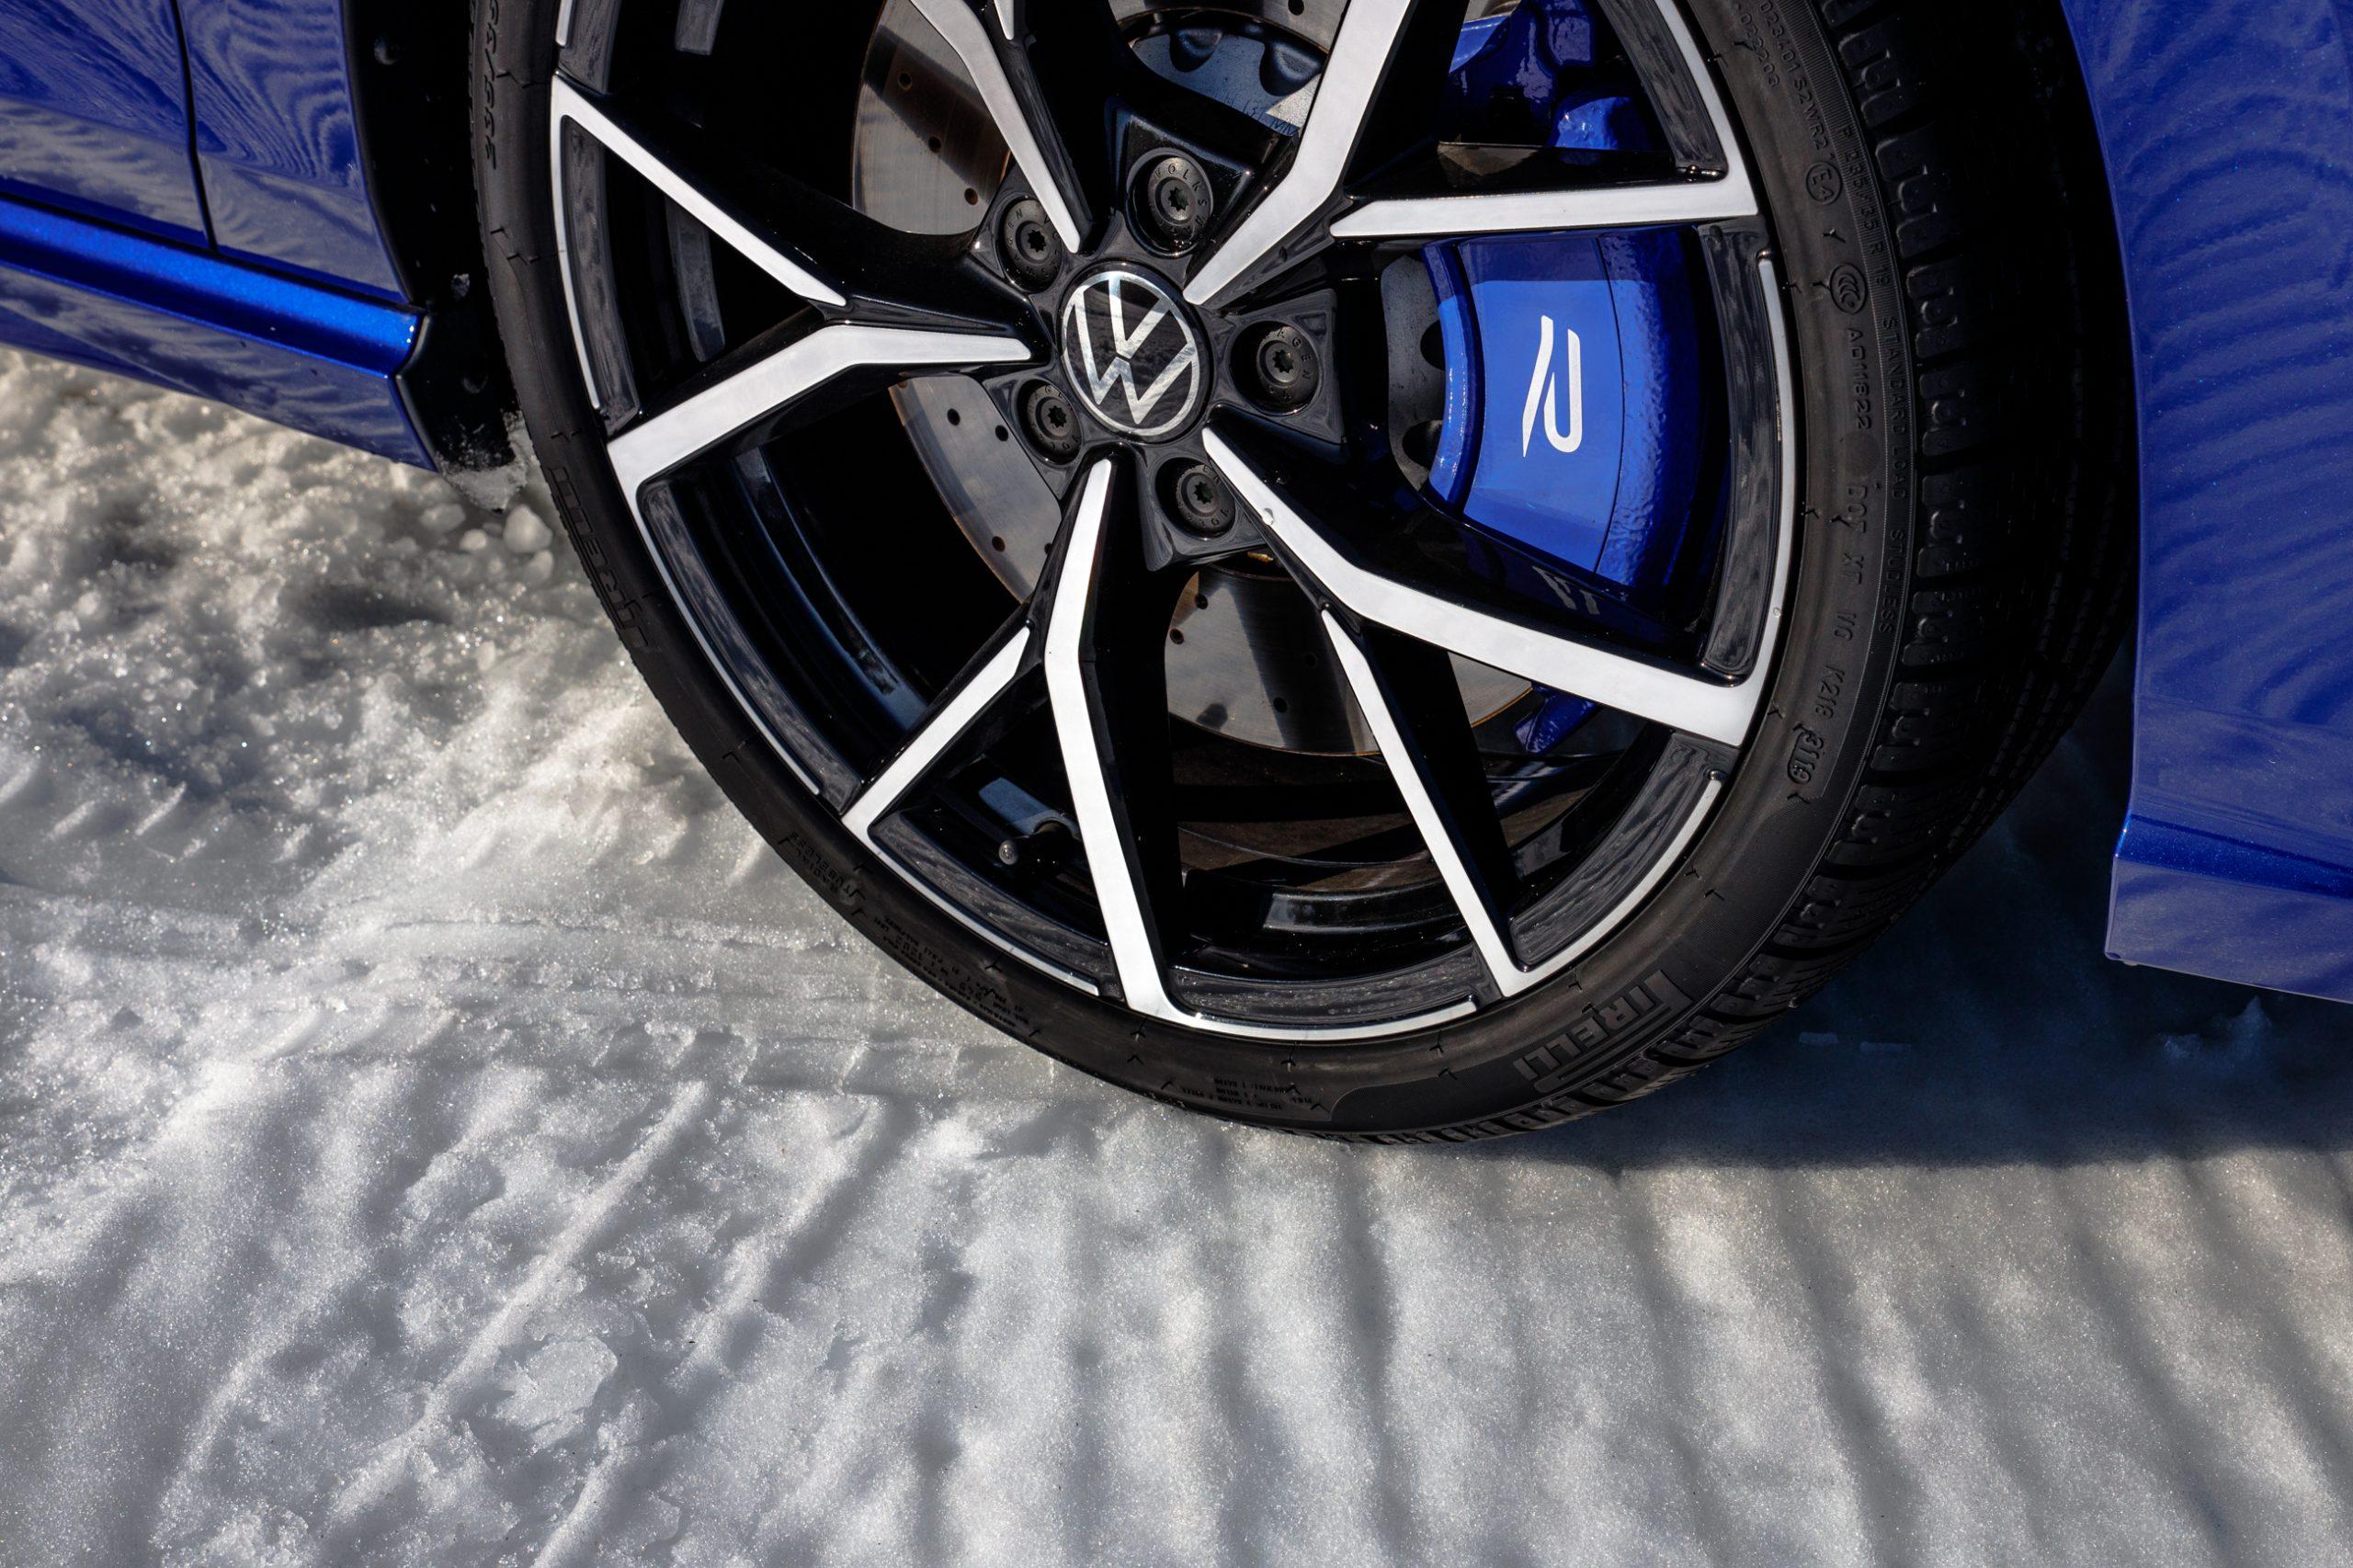 2022 Volkswagen Golf R wheel tire caliper close